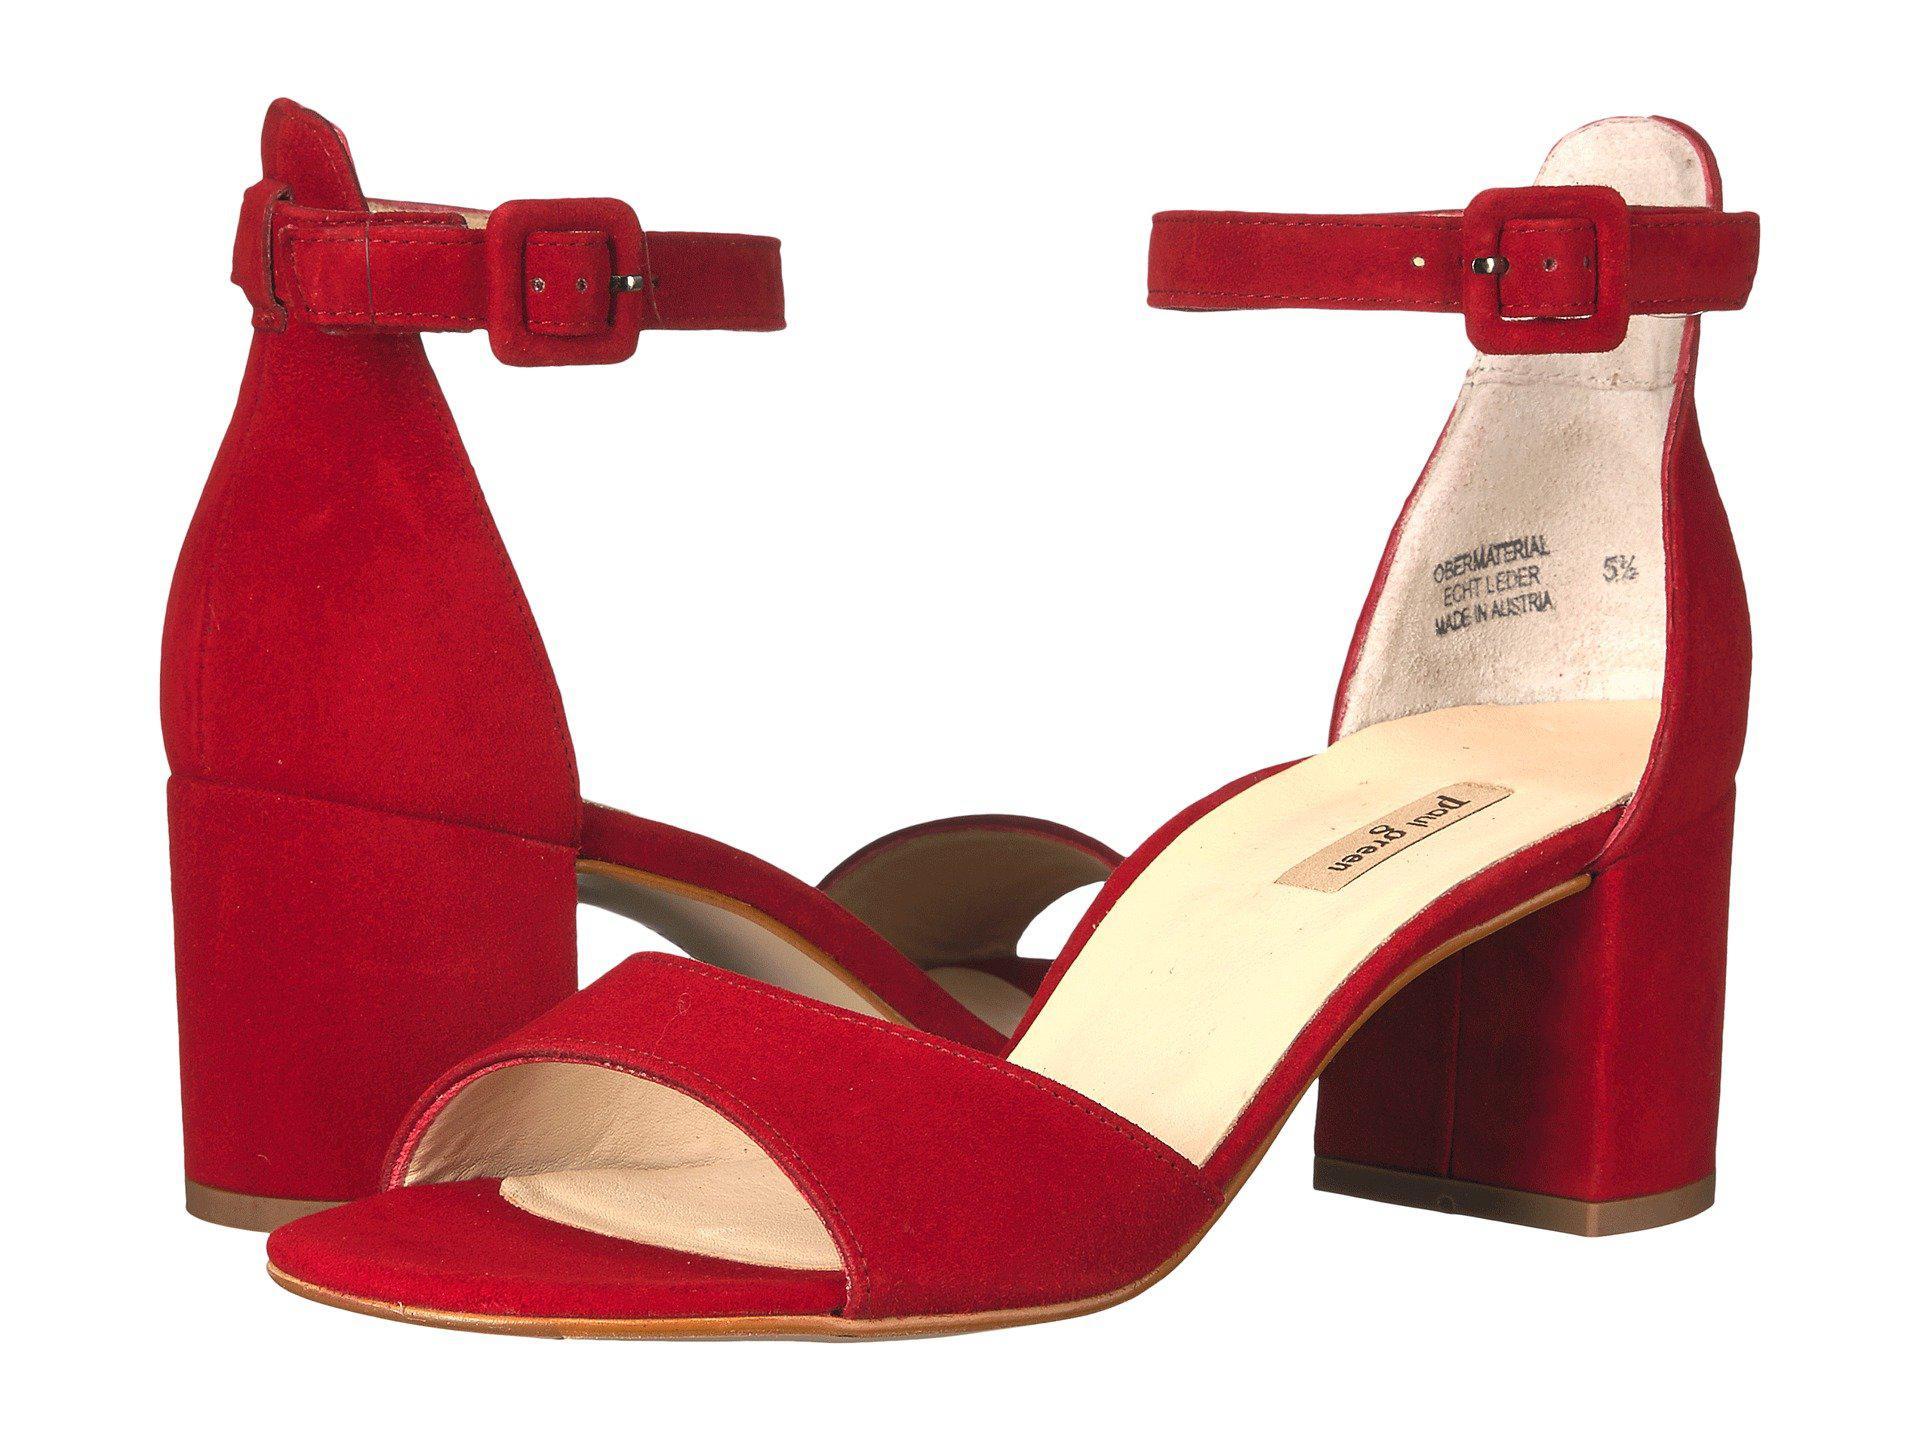 42c2e3b5f2667 Lyst - Paul Green Lonnnie Block Heel Sandals in Red